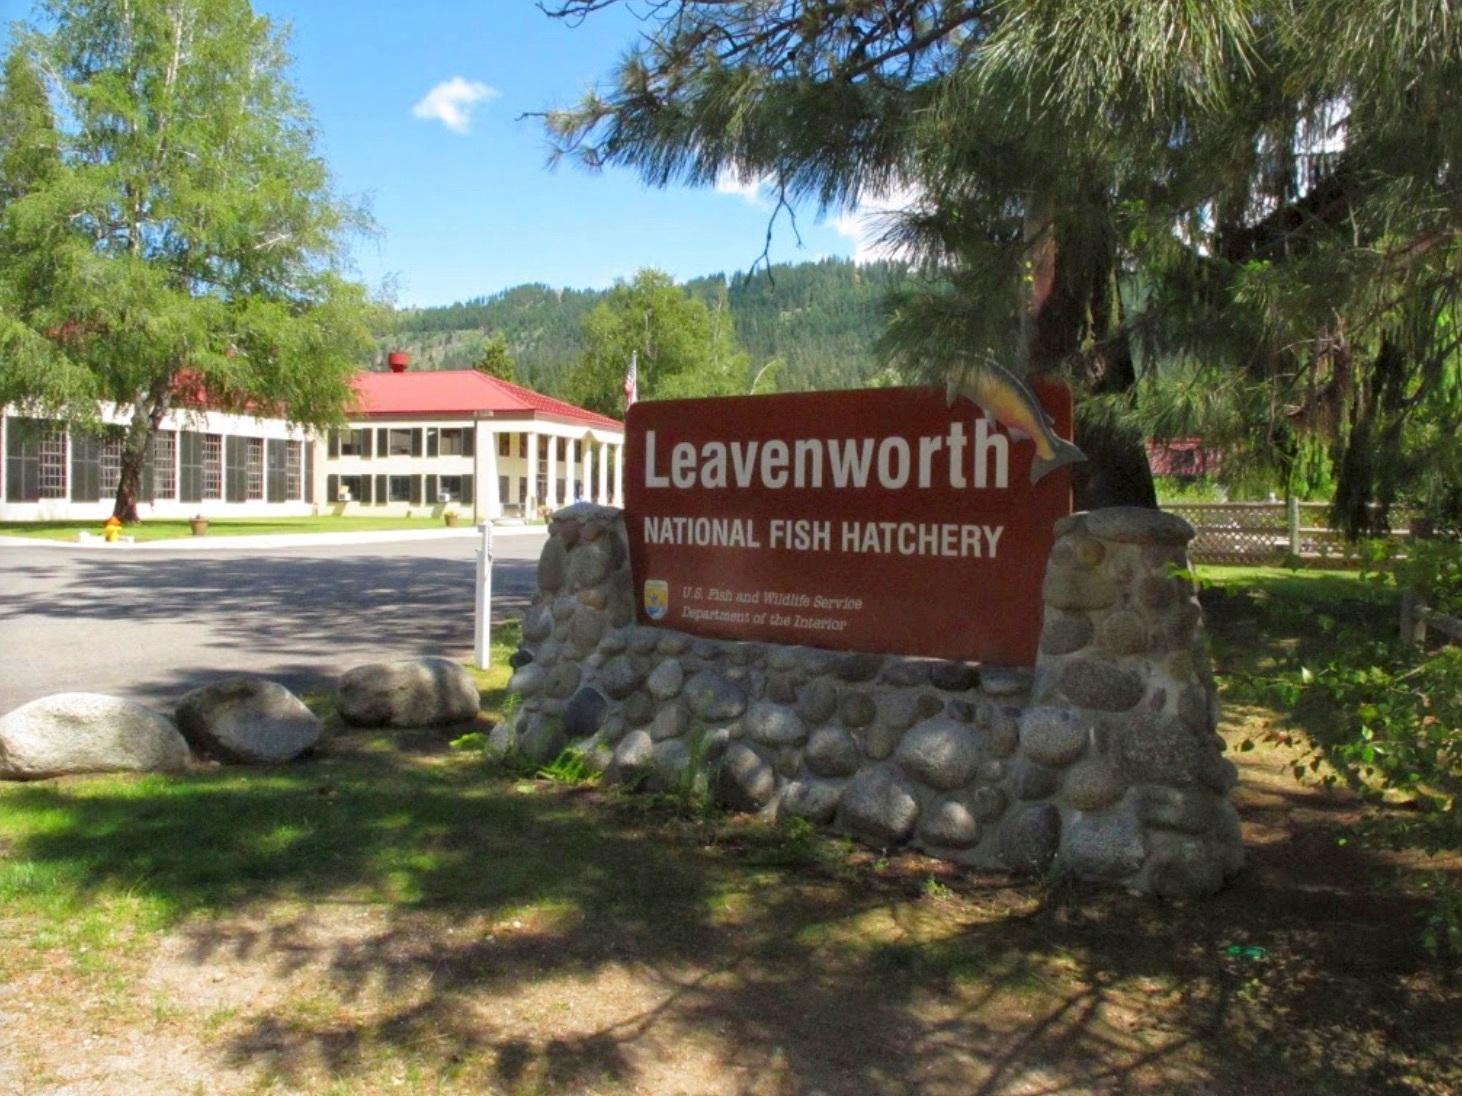 Leavenworth National Fish Hatchery